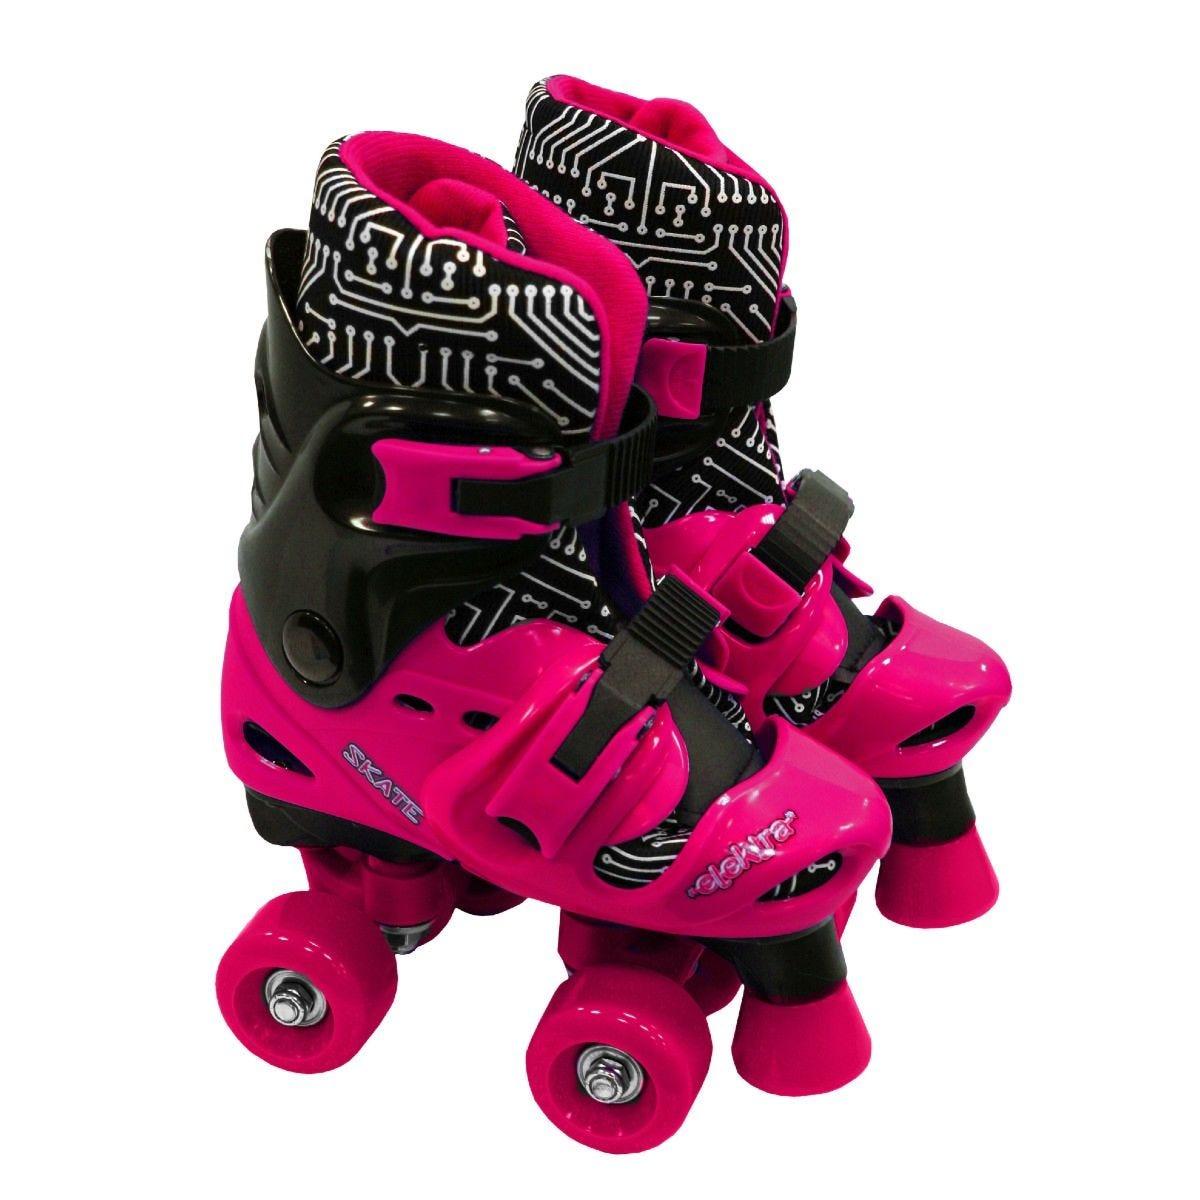 Elektra Quad Boot Adjustable Roller Skates Medium Black and Pink